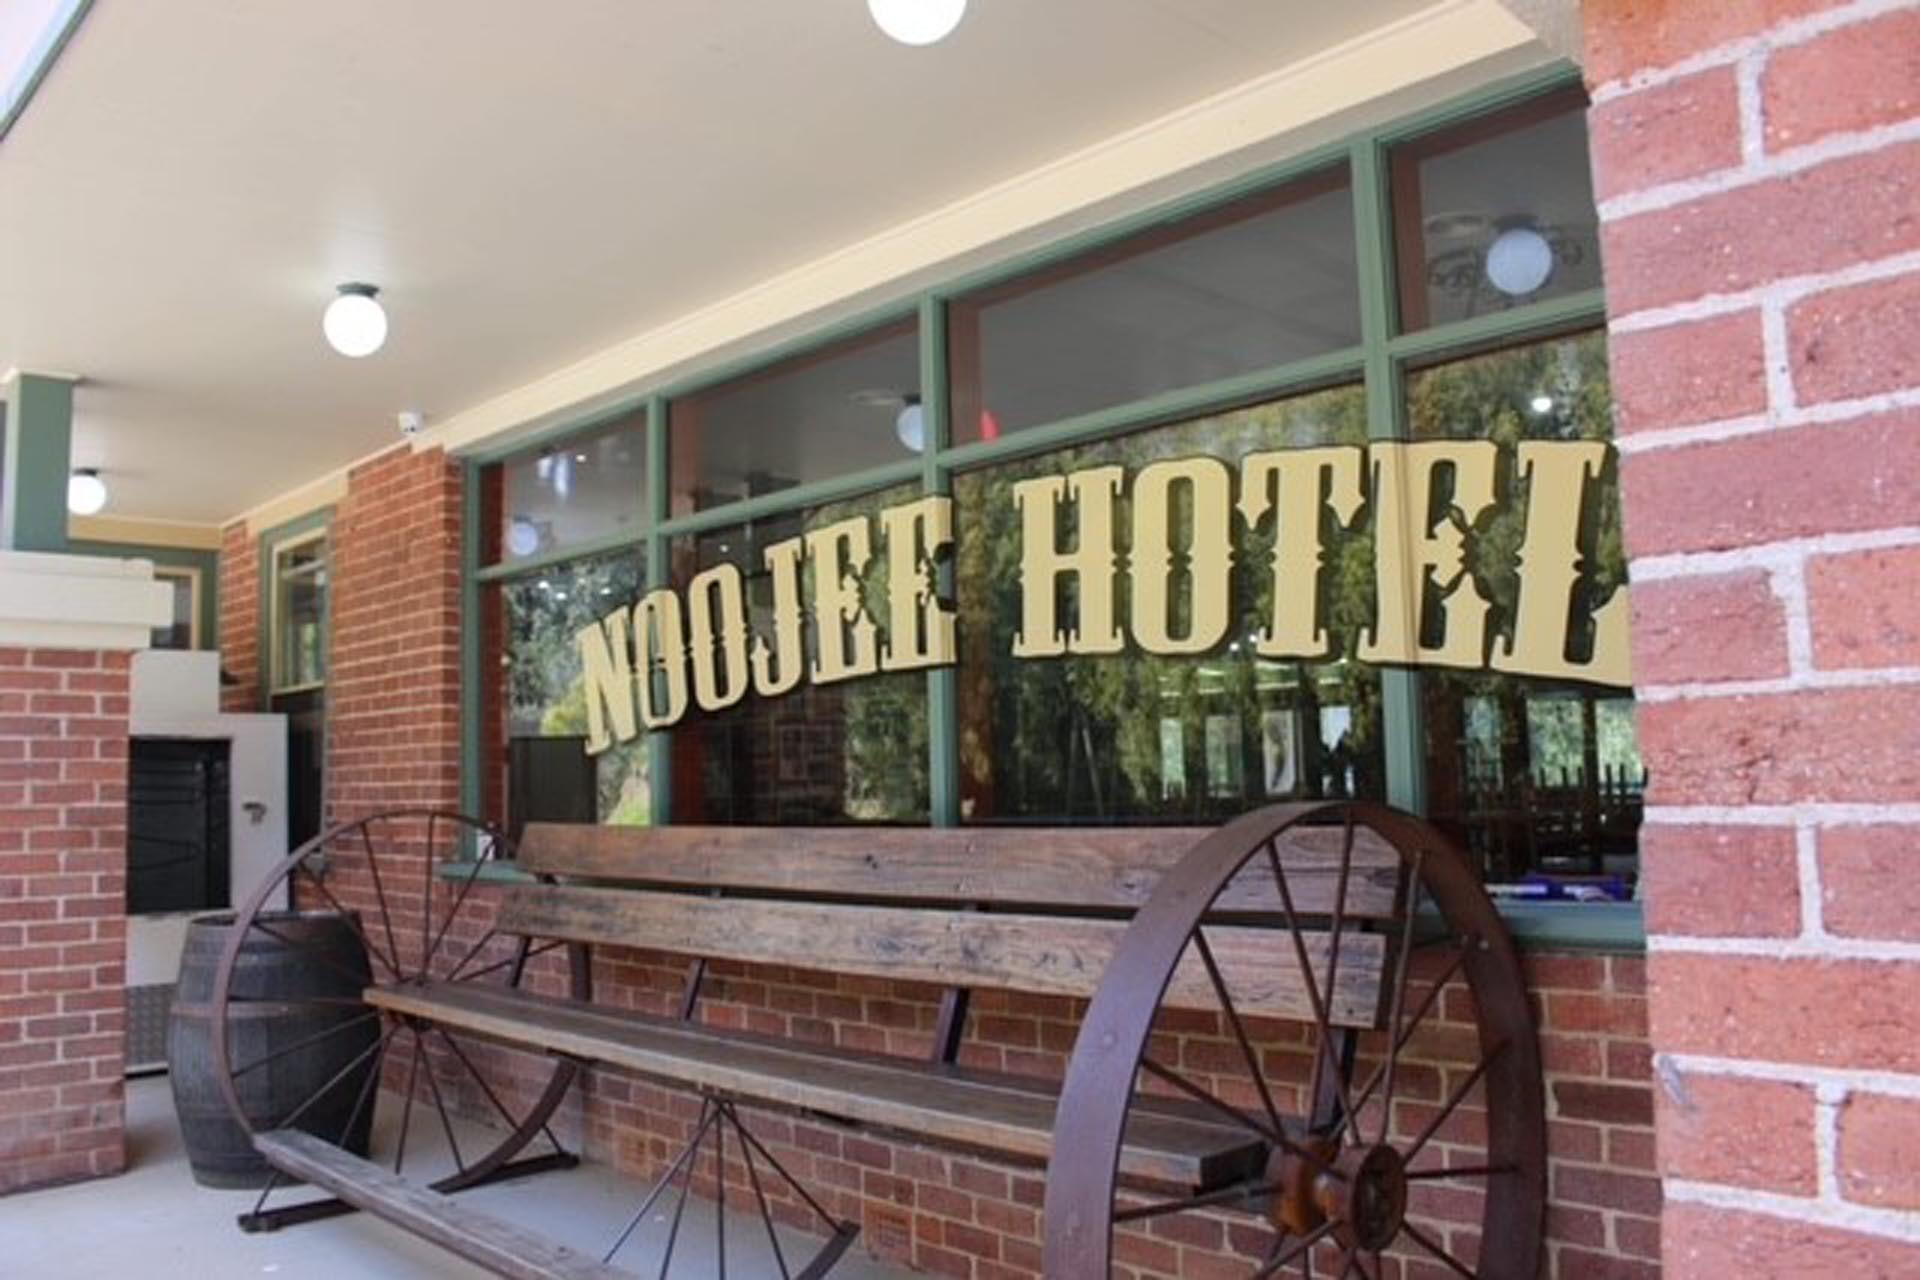 m - Noojee Hotel